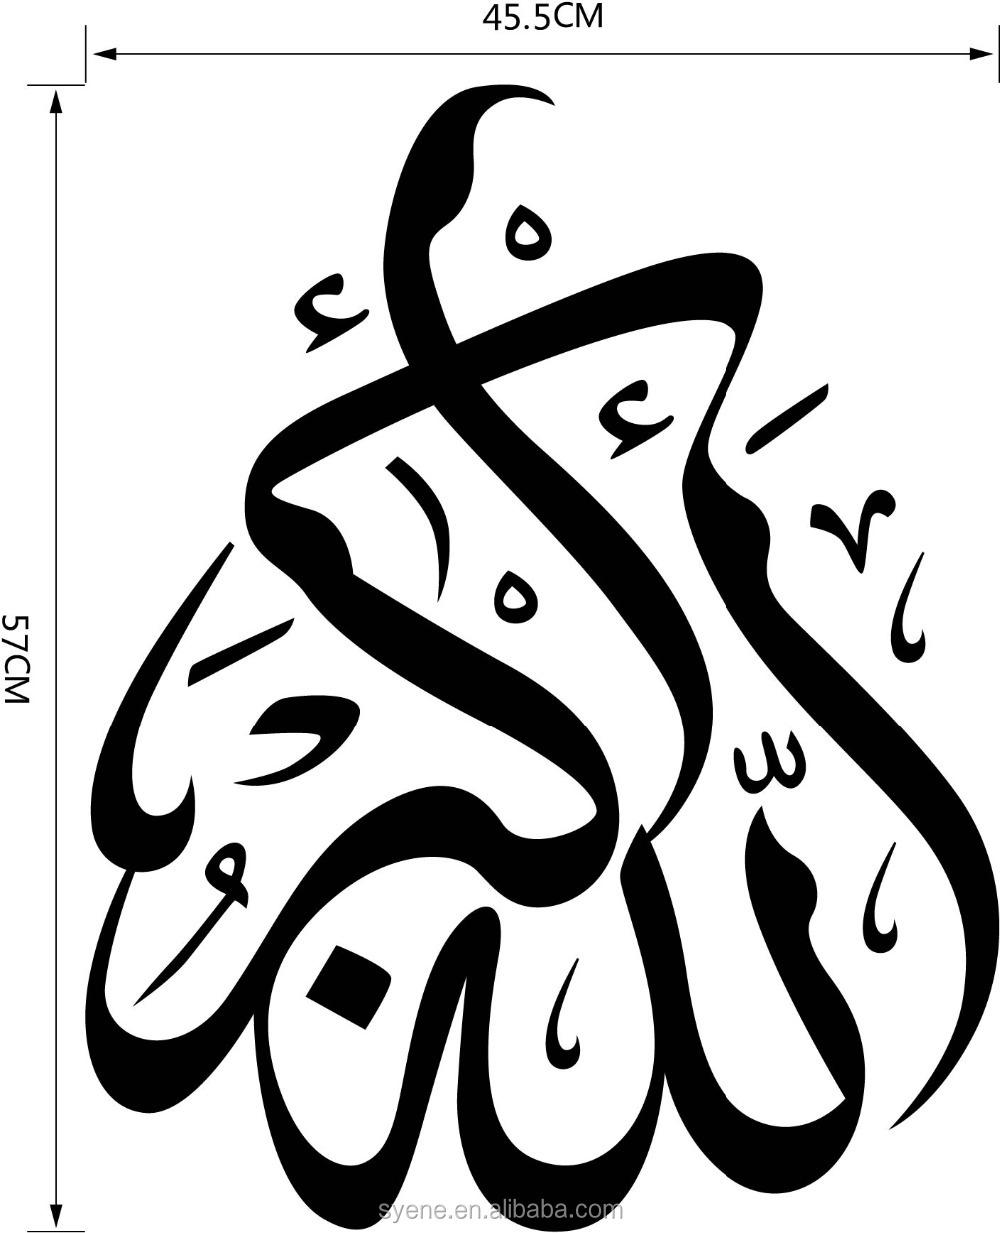 Newest Islamic And Arabic Wall Stickers Art Vinyl Alphabet Letter ...